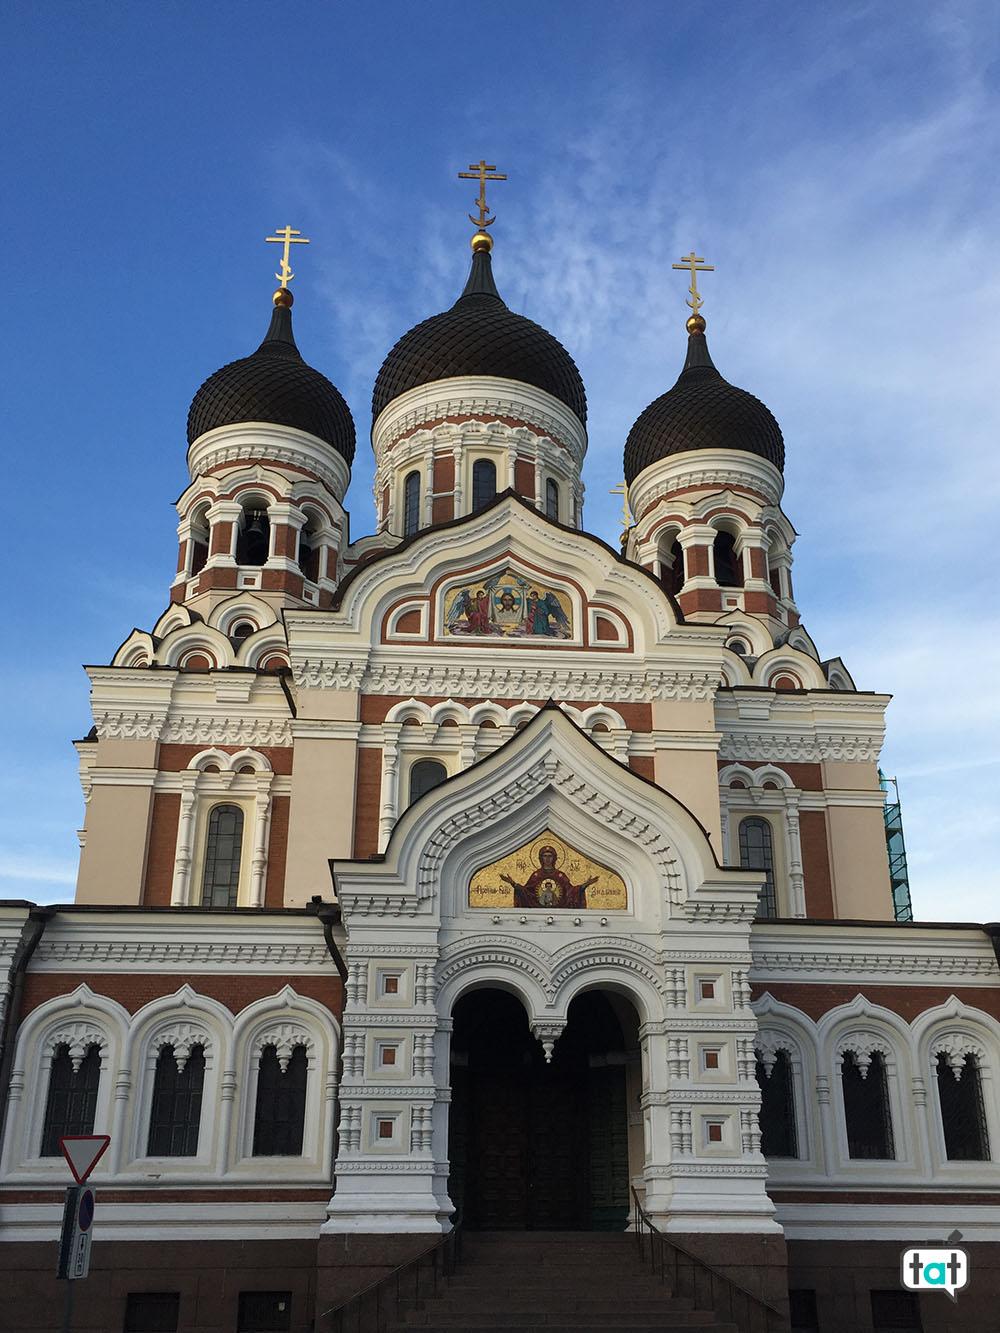 tallinn cattedrale aleksandr nevsky